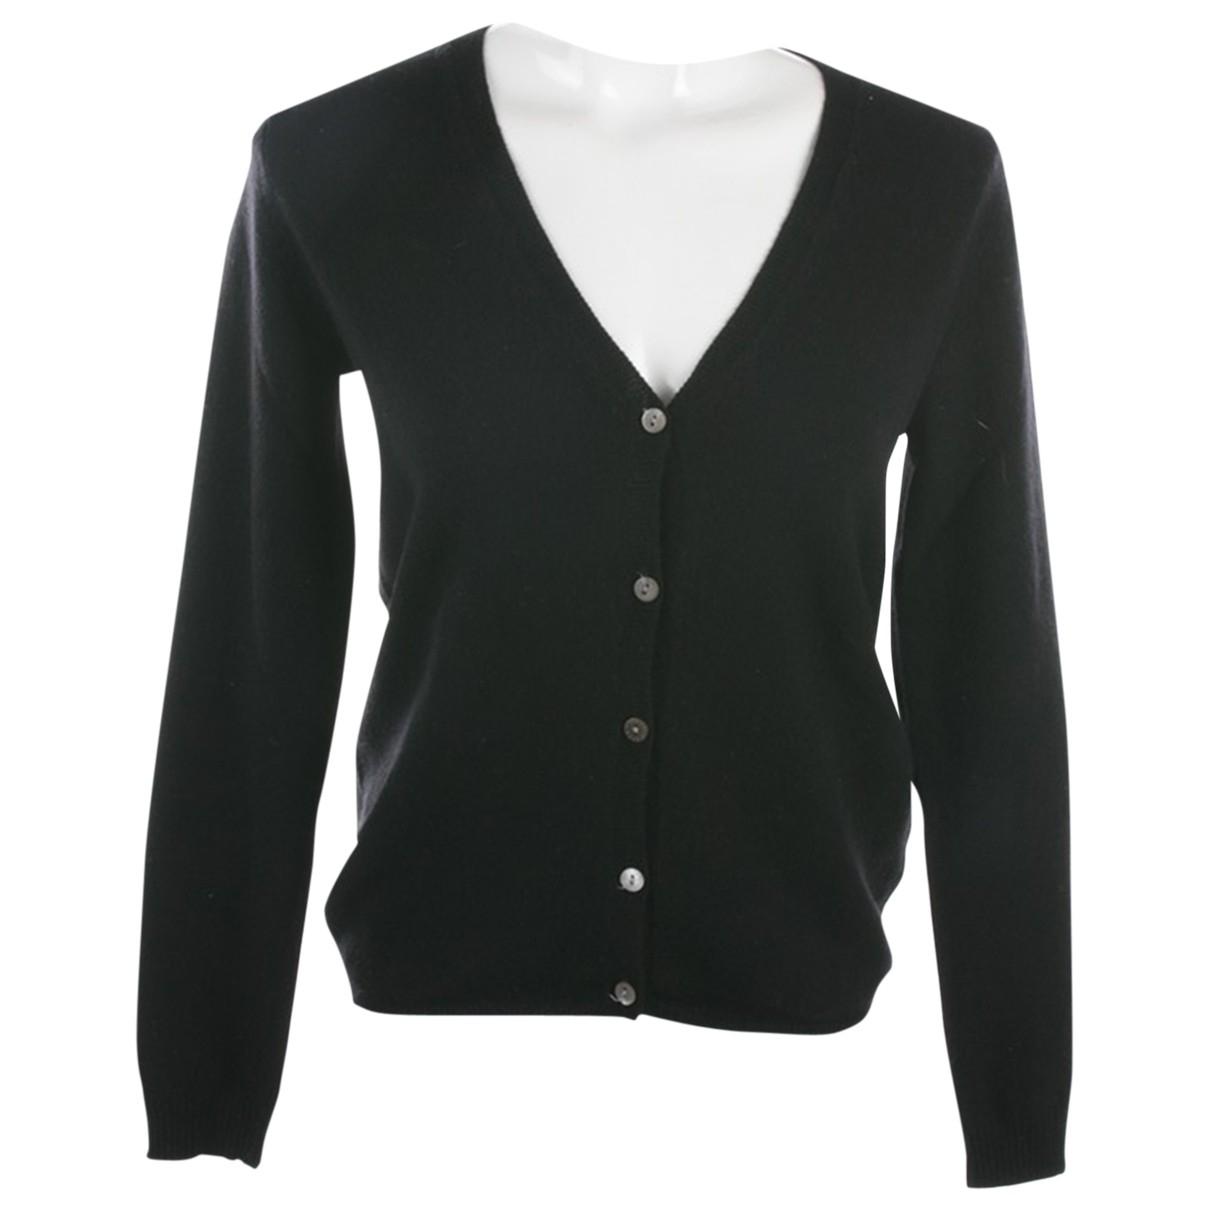 Ftc Cashmere \N Black Cashmere Knitwear for Women S International